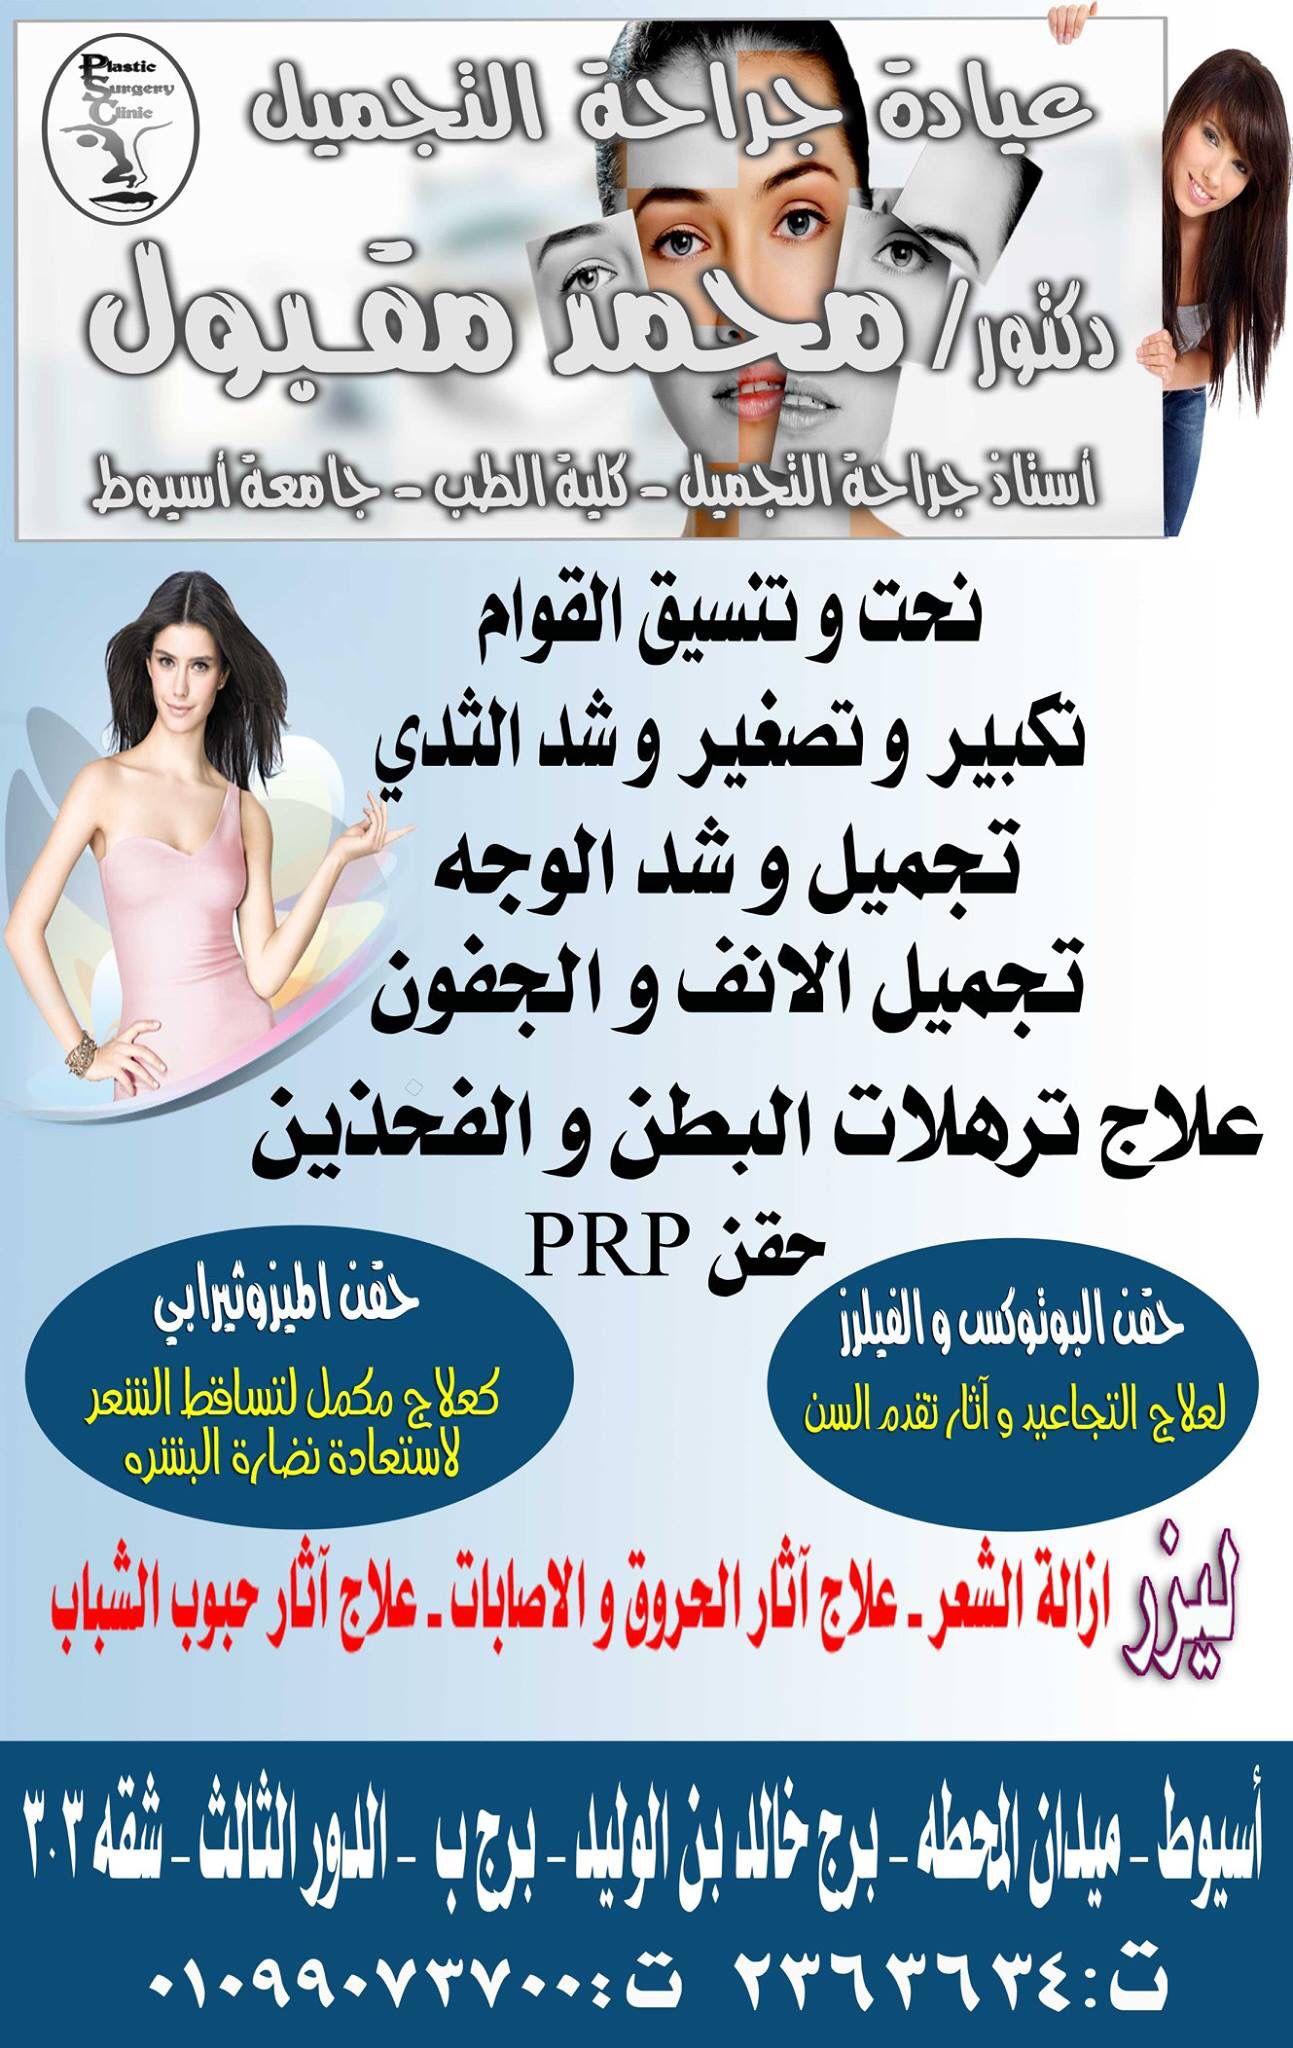 Plastic Surgery Clinic Cosmetic Surgery Plastic Surgery Surgery